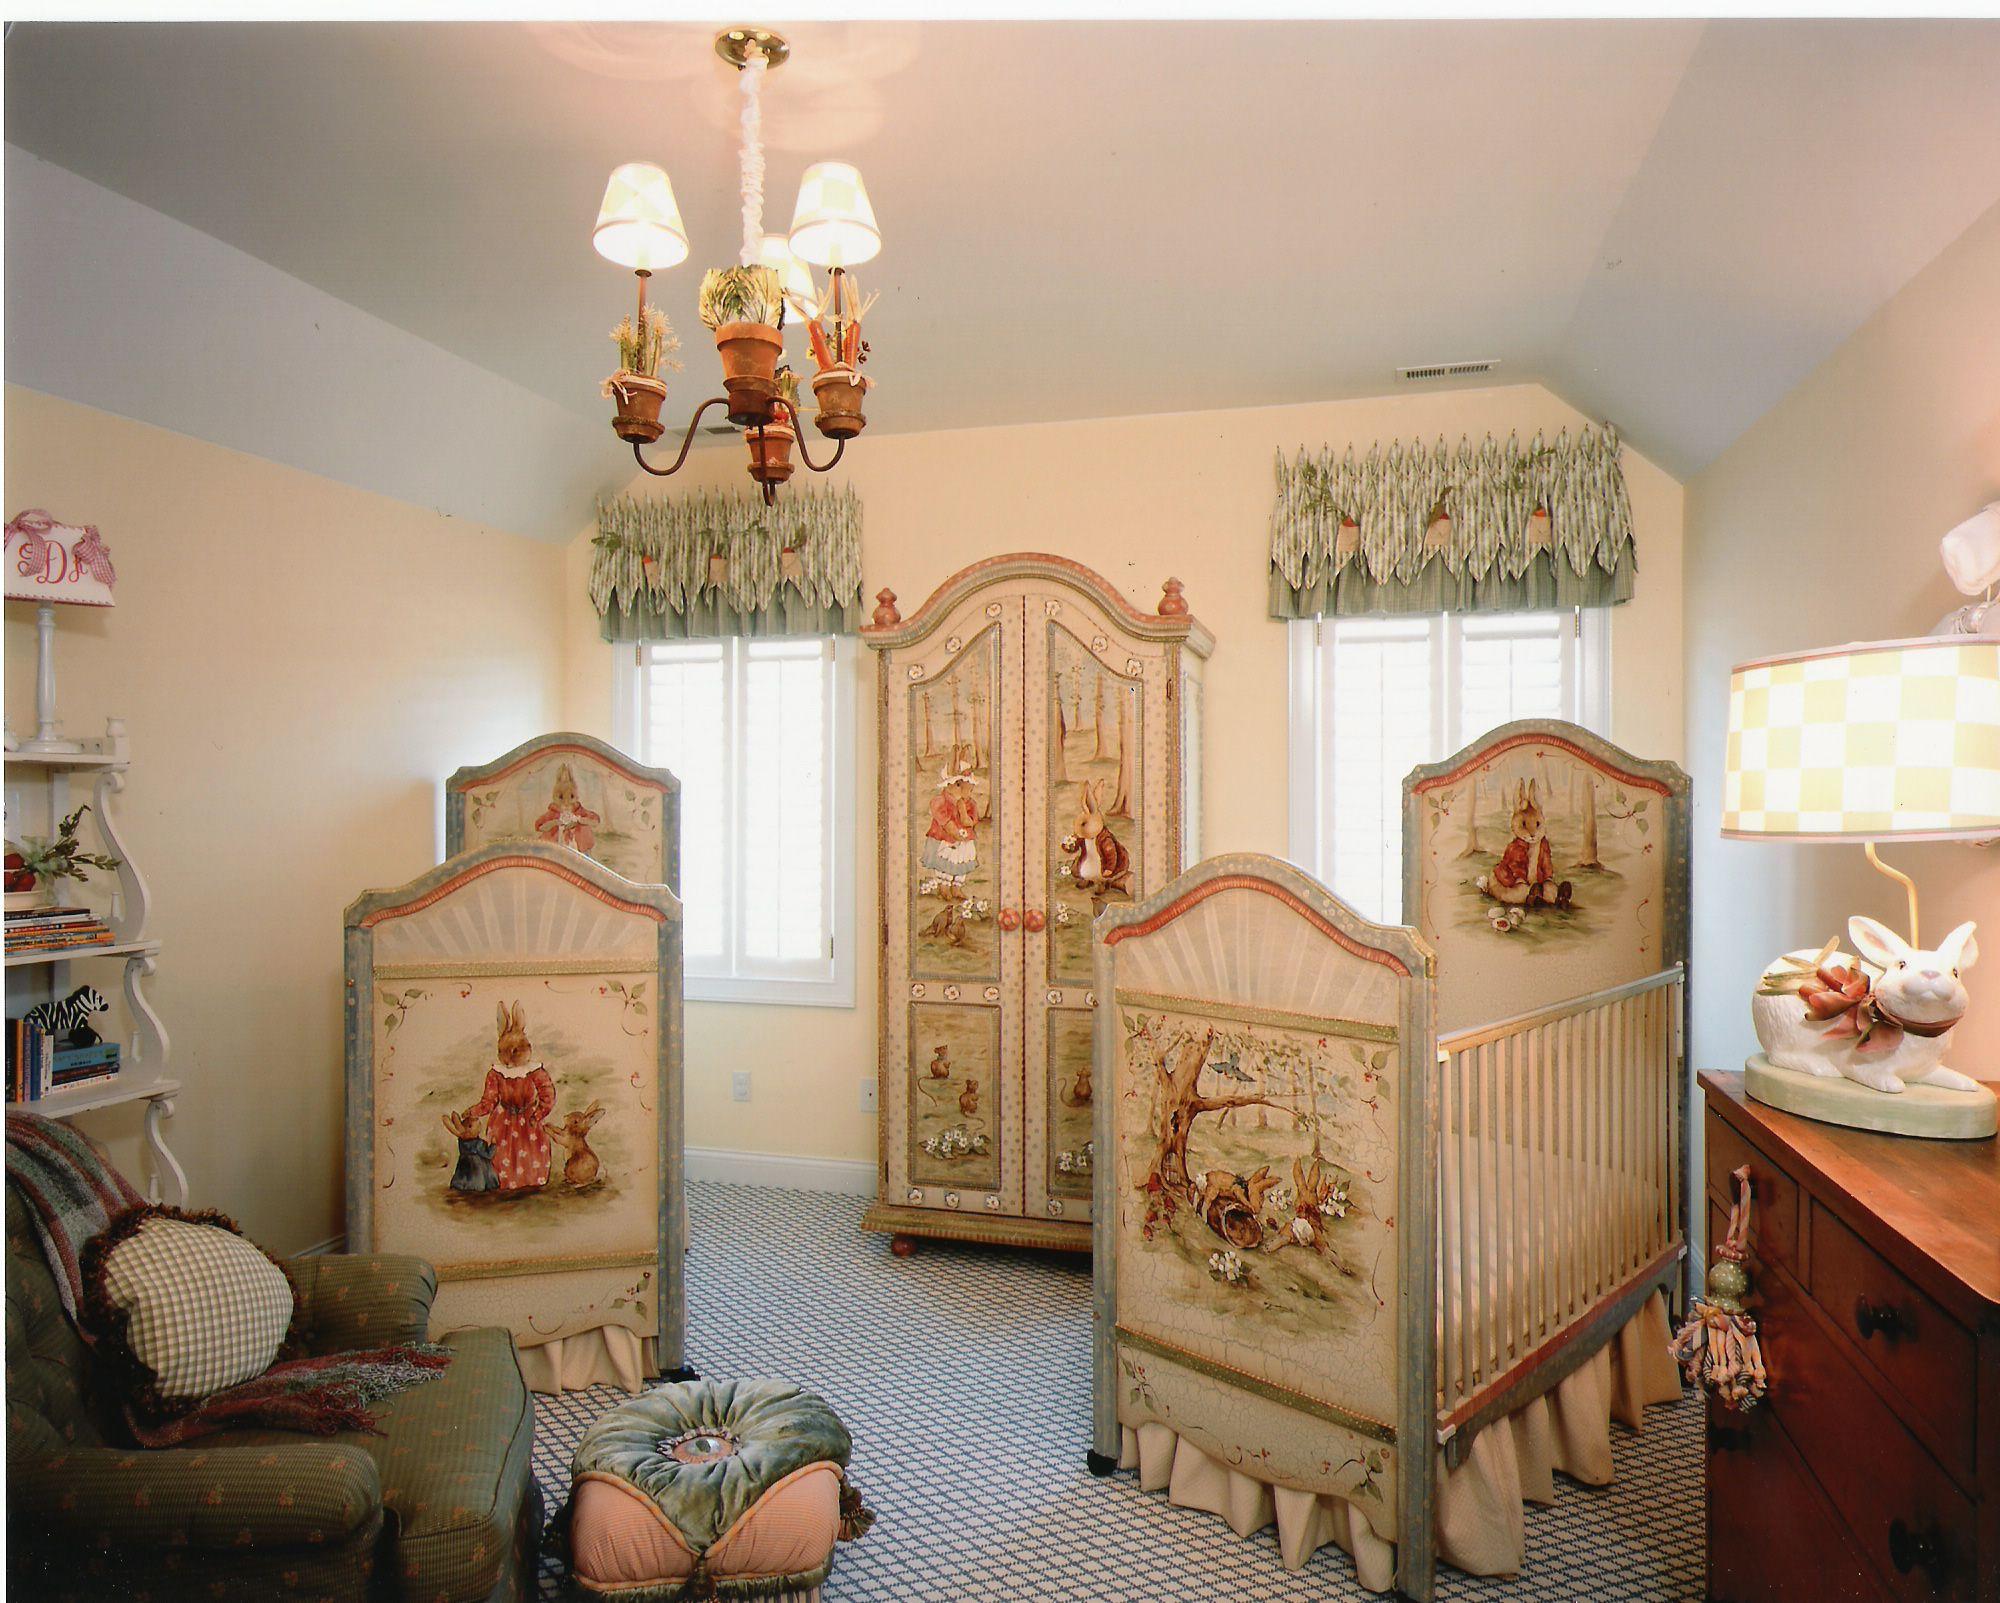 Peter Rabbit Nursery Baby Room Decor